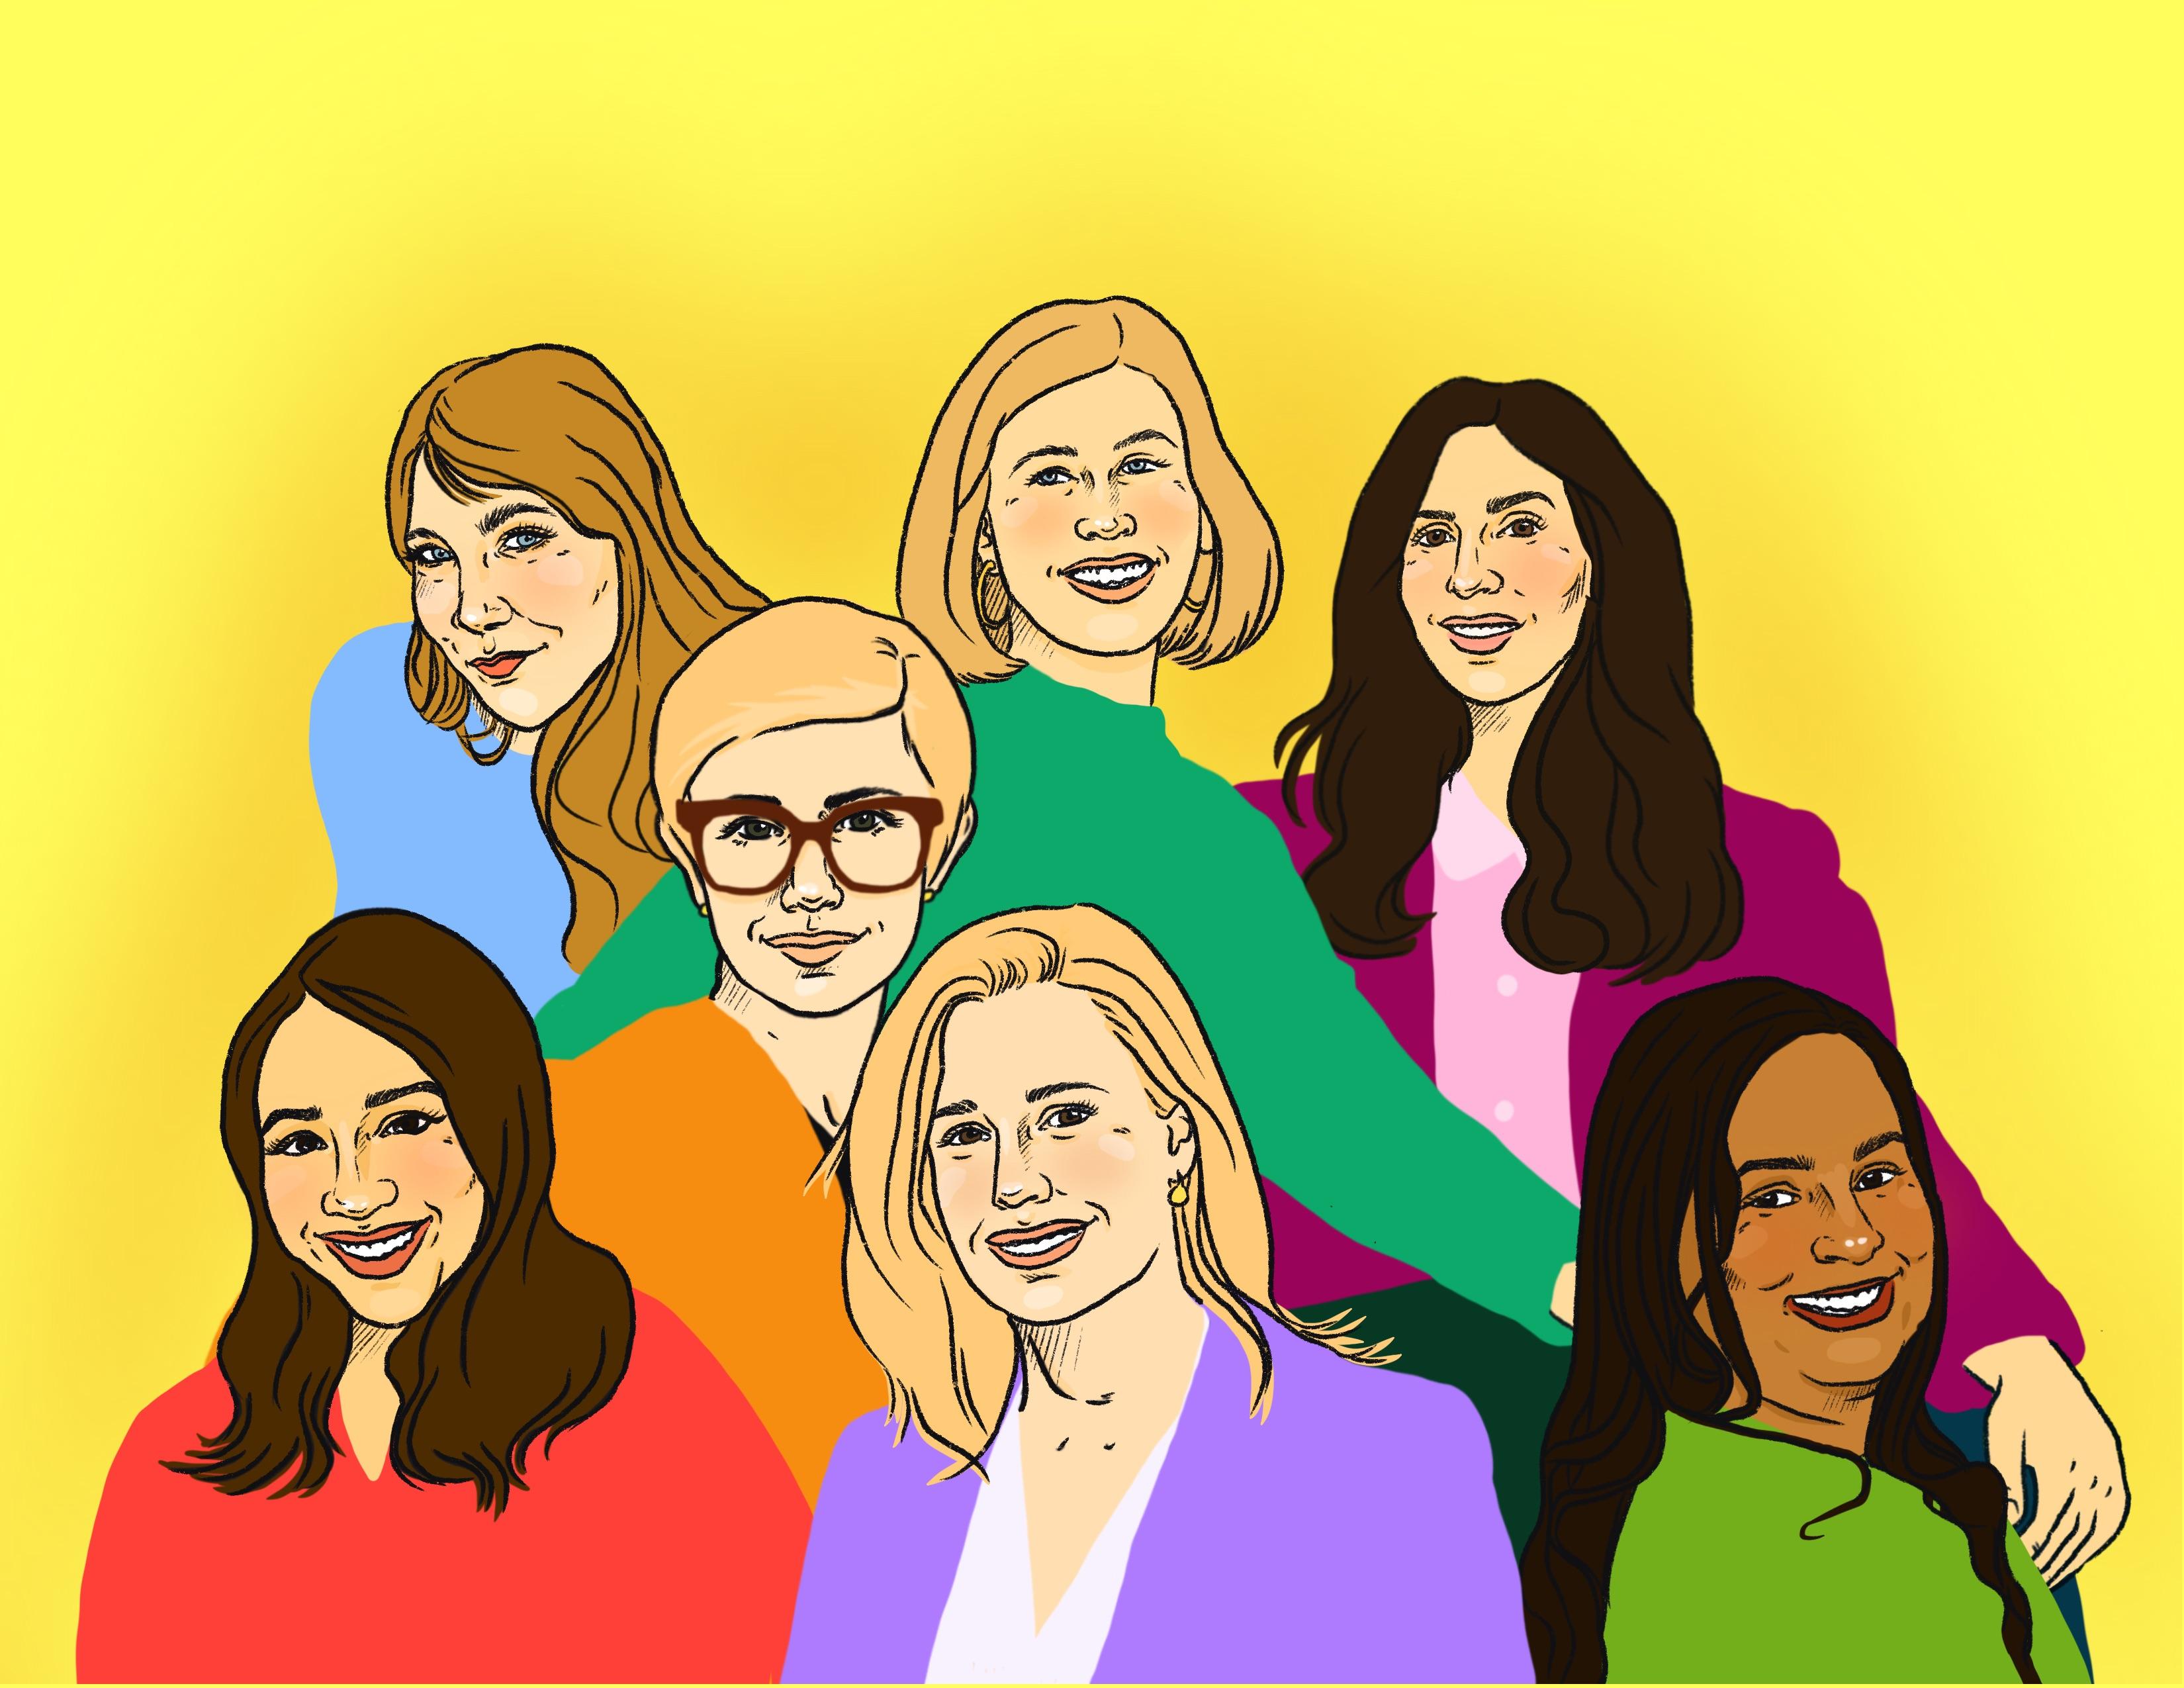 Top row: Fiona Hughes, Alexa Tonner, Natalie Silverstein. Middle: Ryan Stern. Bottom: Angelita Sierra, Amy Luca, Rashmi Nigam.